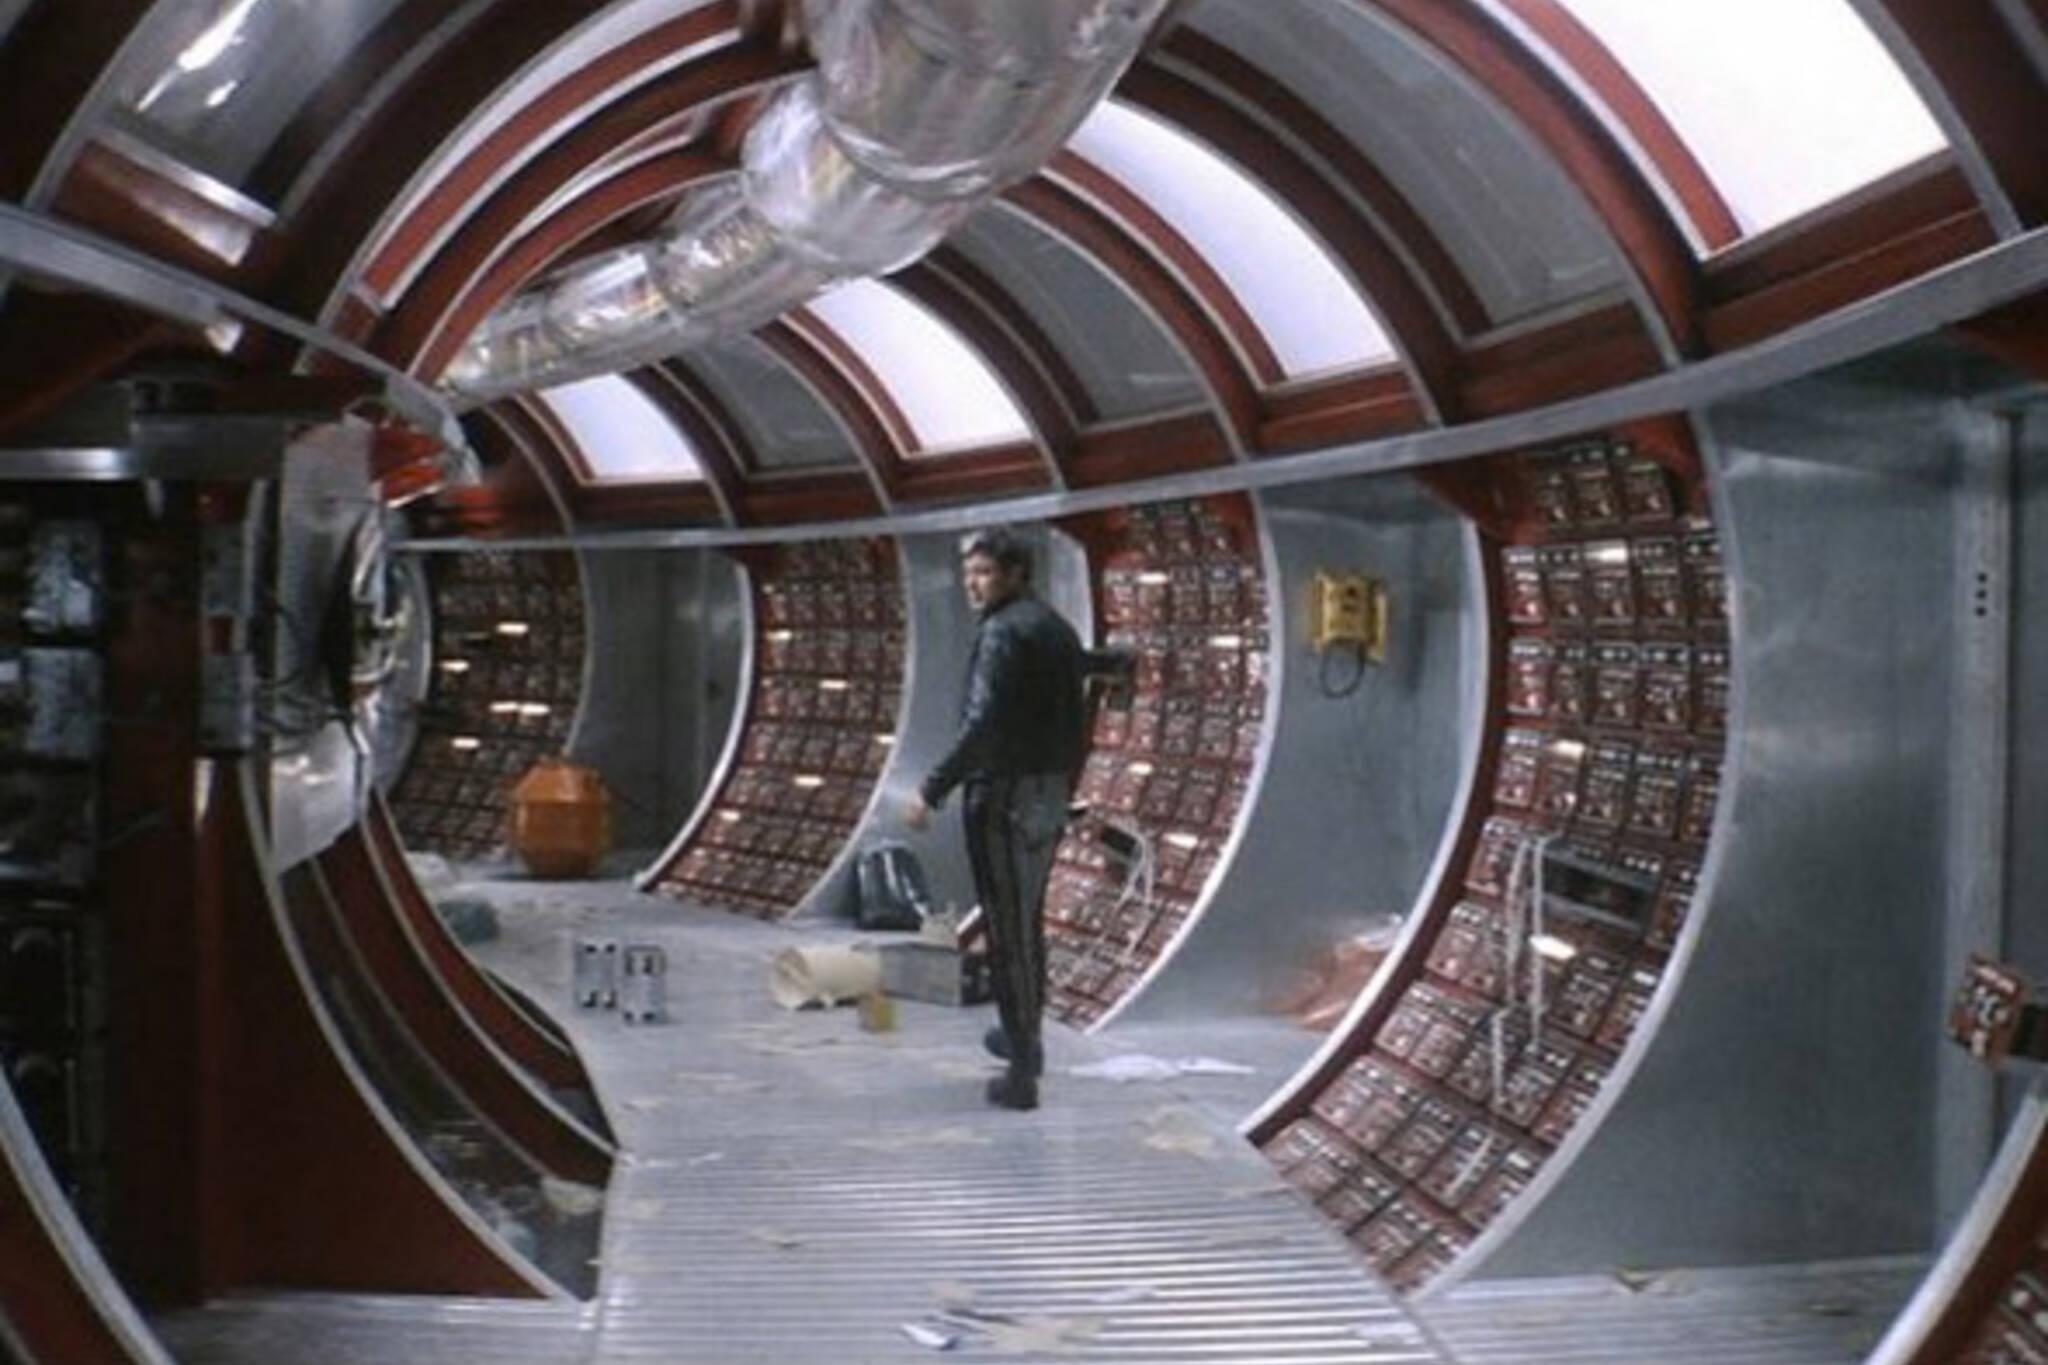 Sci-Fi TIFF series Toronto film